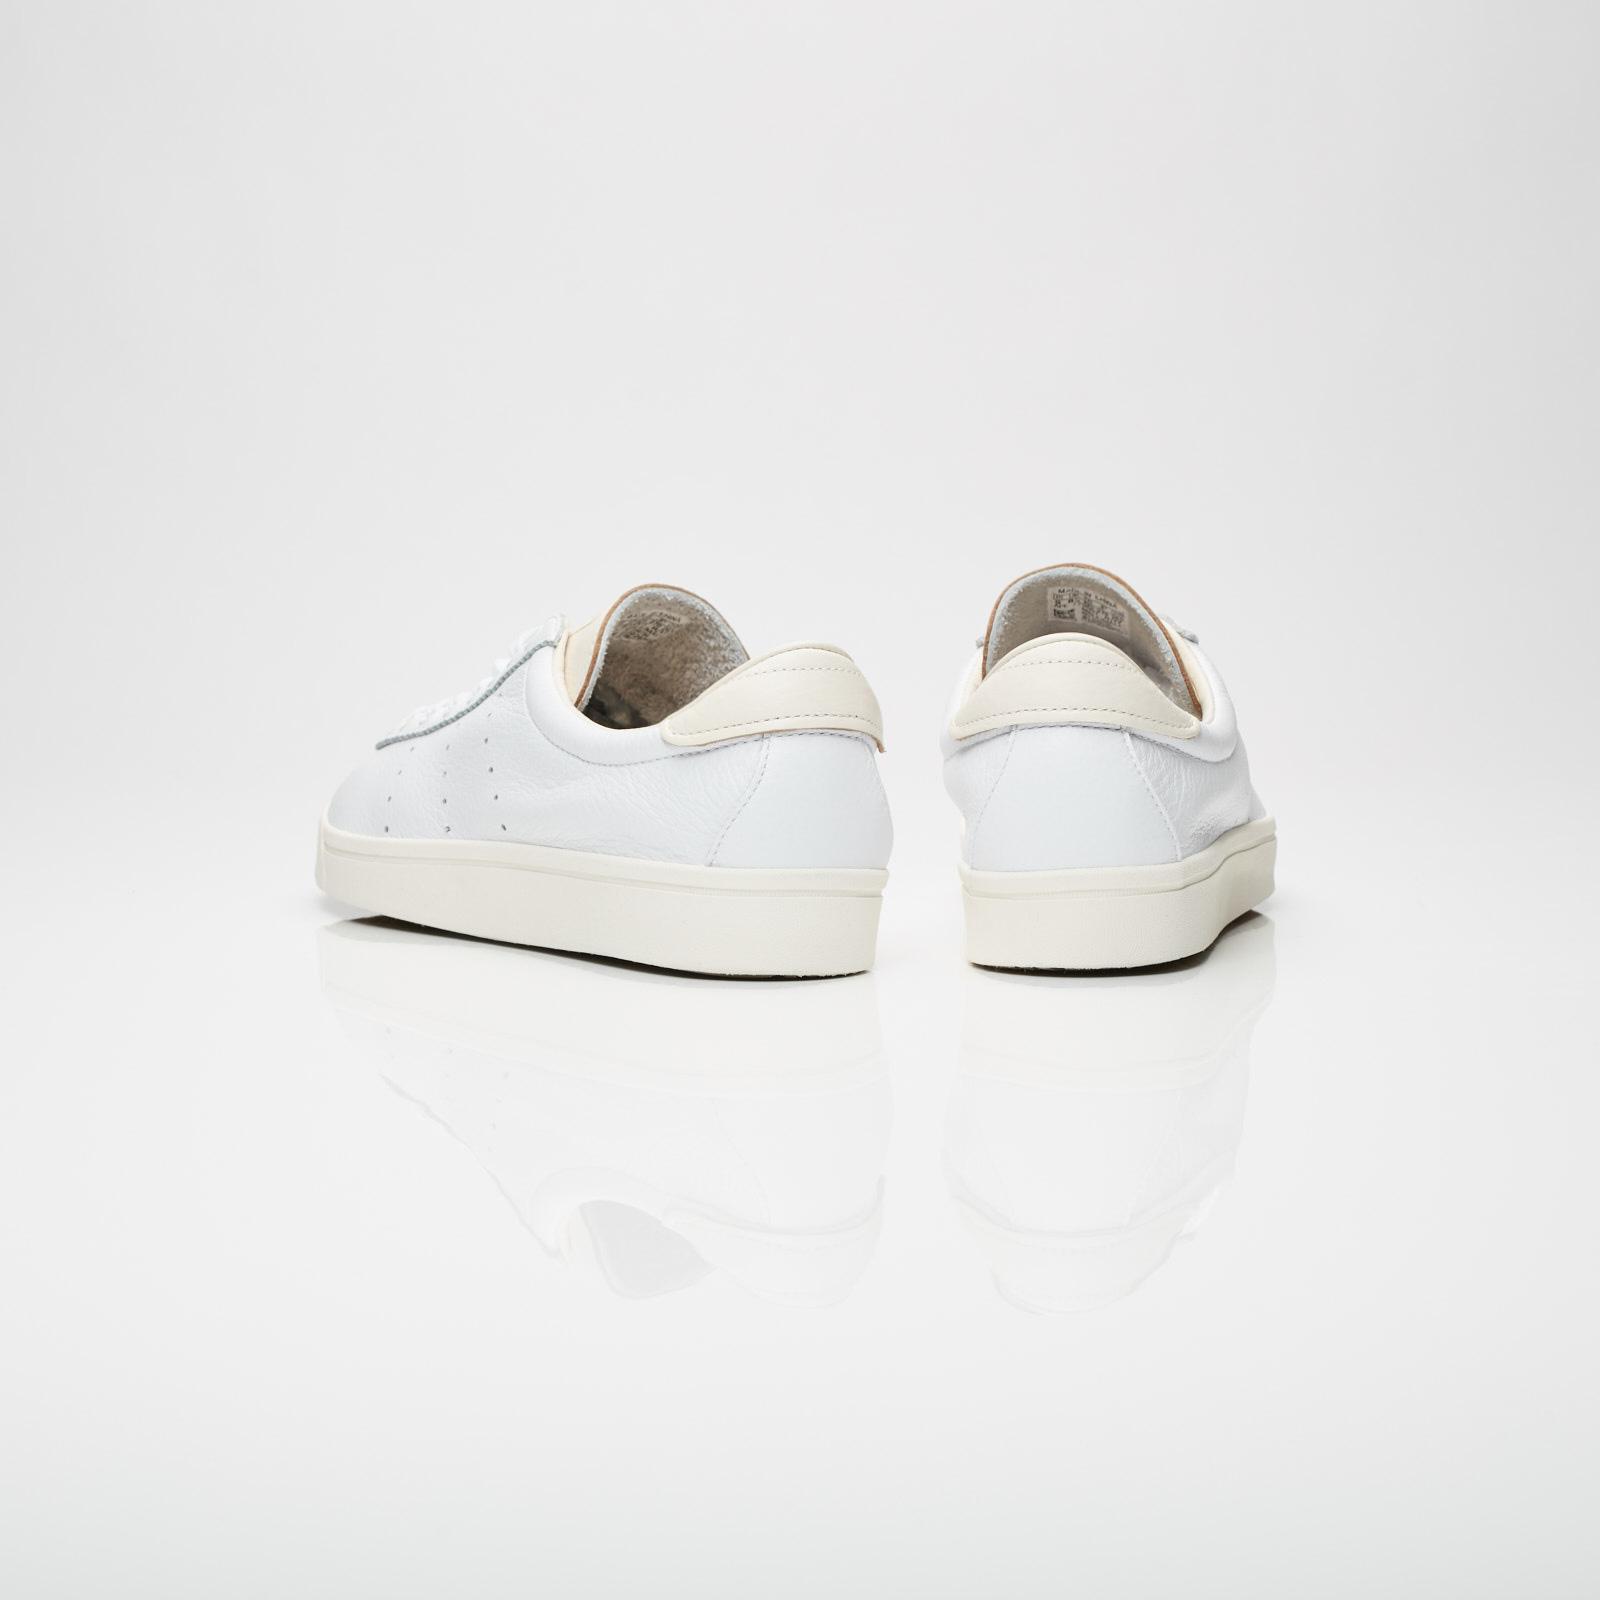 Da8786 Adidas Lacombe Spzl Core Weiß Core Weiß Metallic